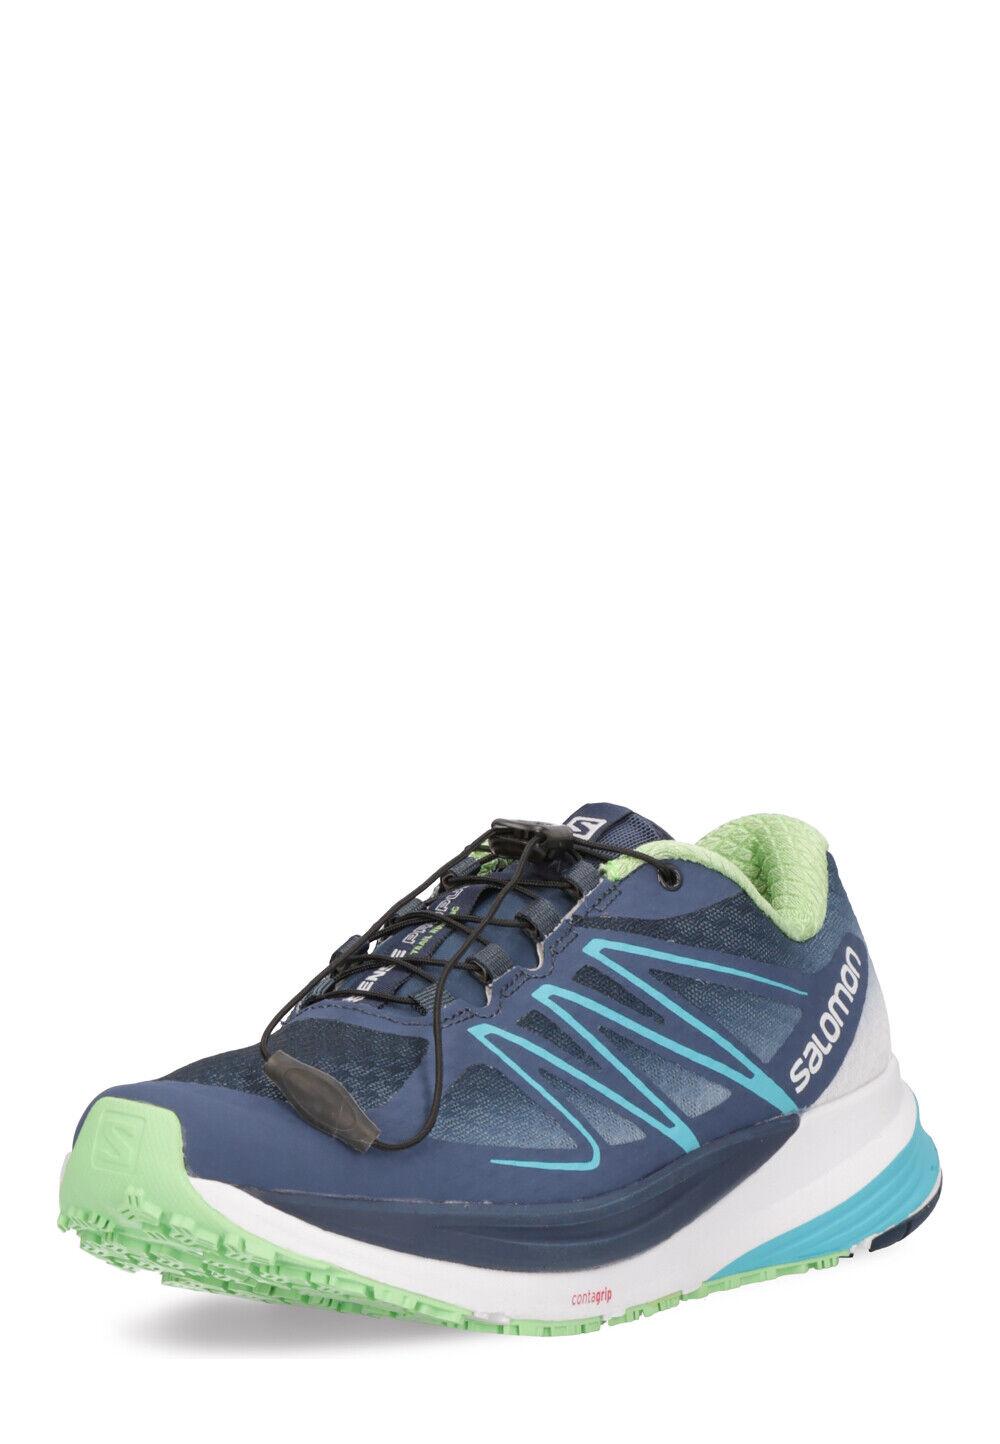 100% anbieten Trail Damen Running Schuhe Lauf SALOMON